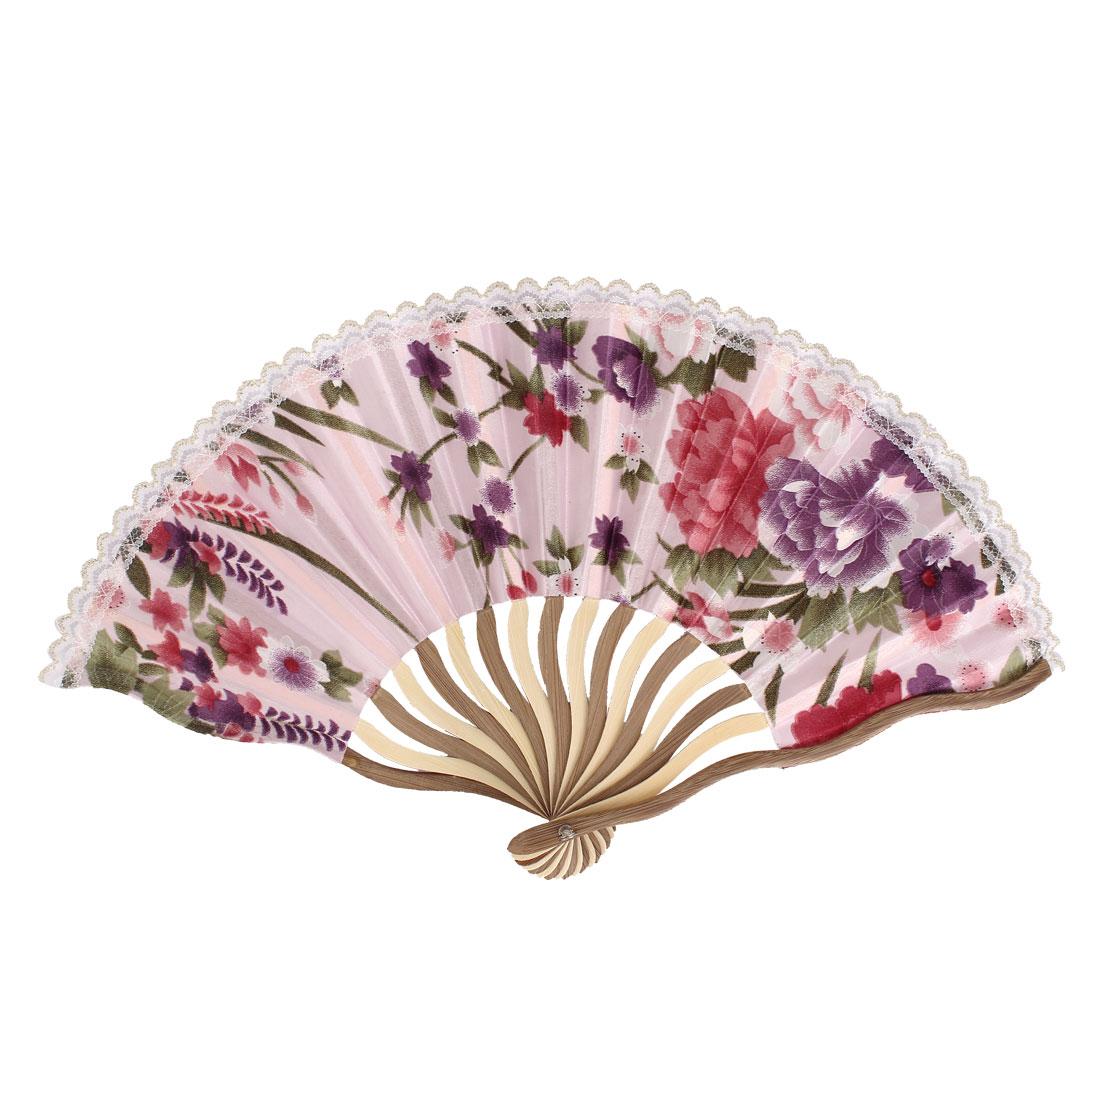 Wood Frame Flowers Pattern Lace Rim Dancing Party Folding Hand Fan Pink